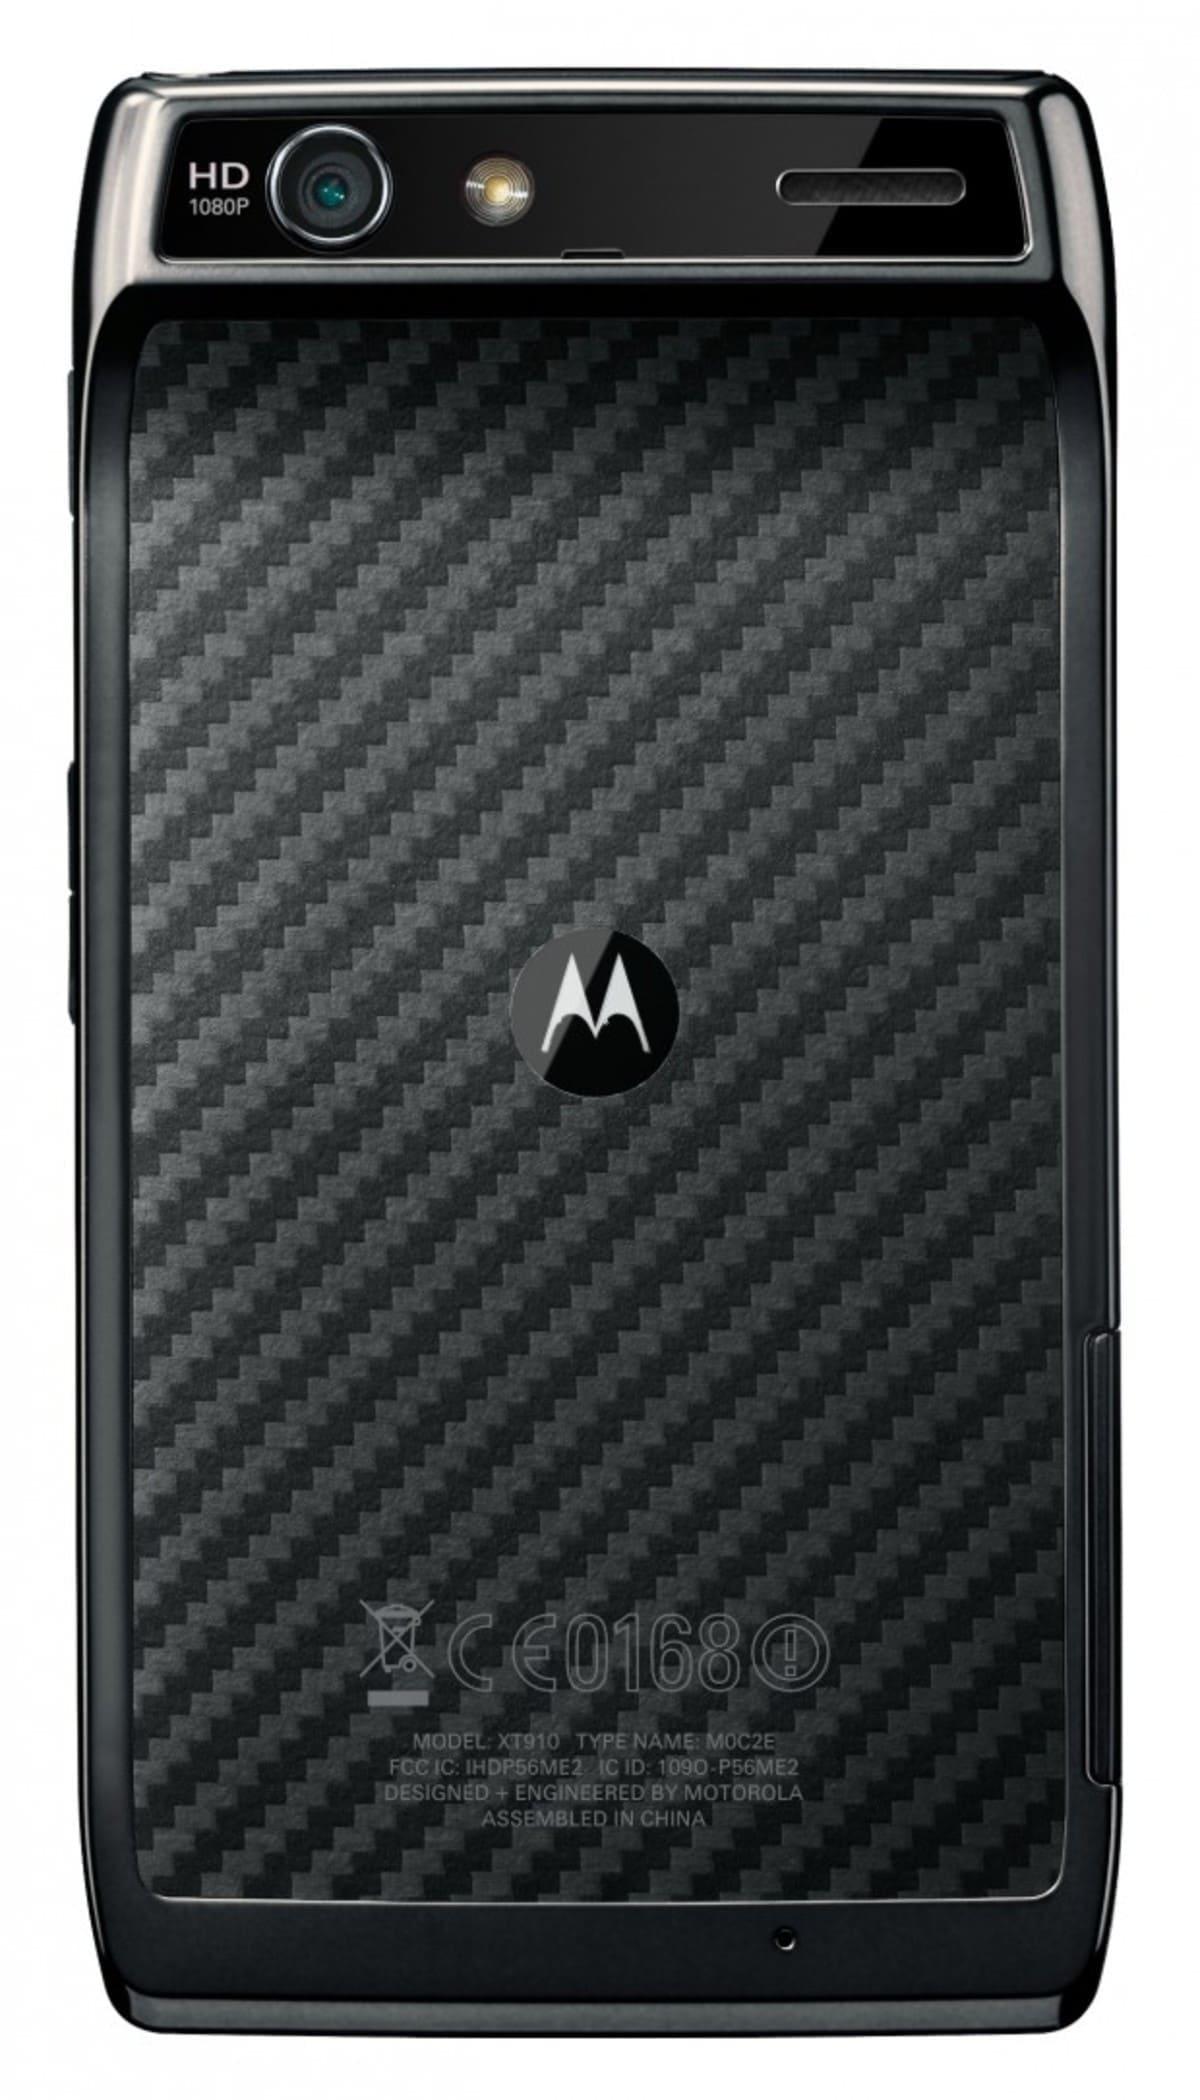 Motorola RAZR 2 e1318960814238 1